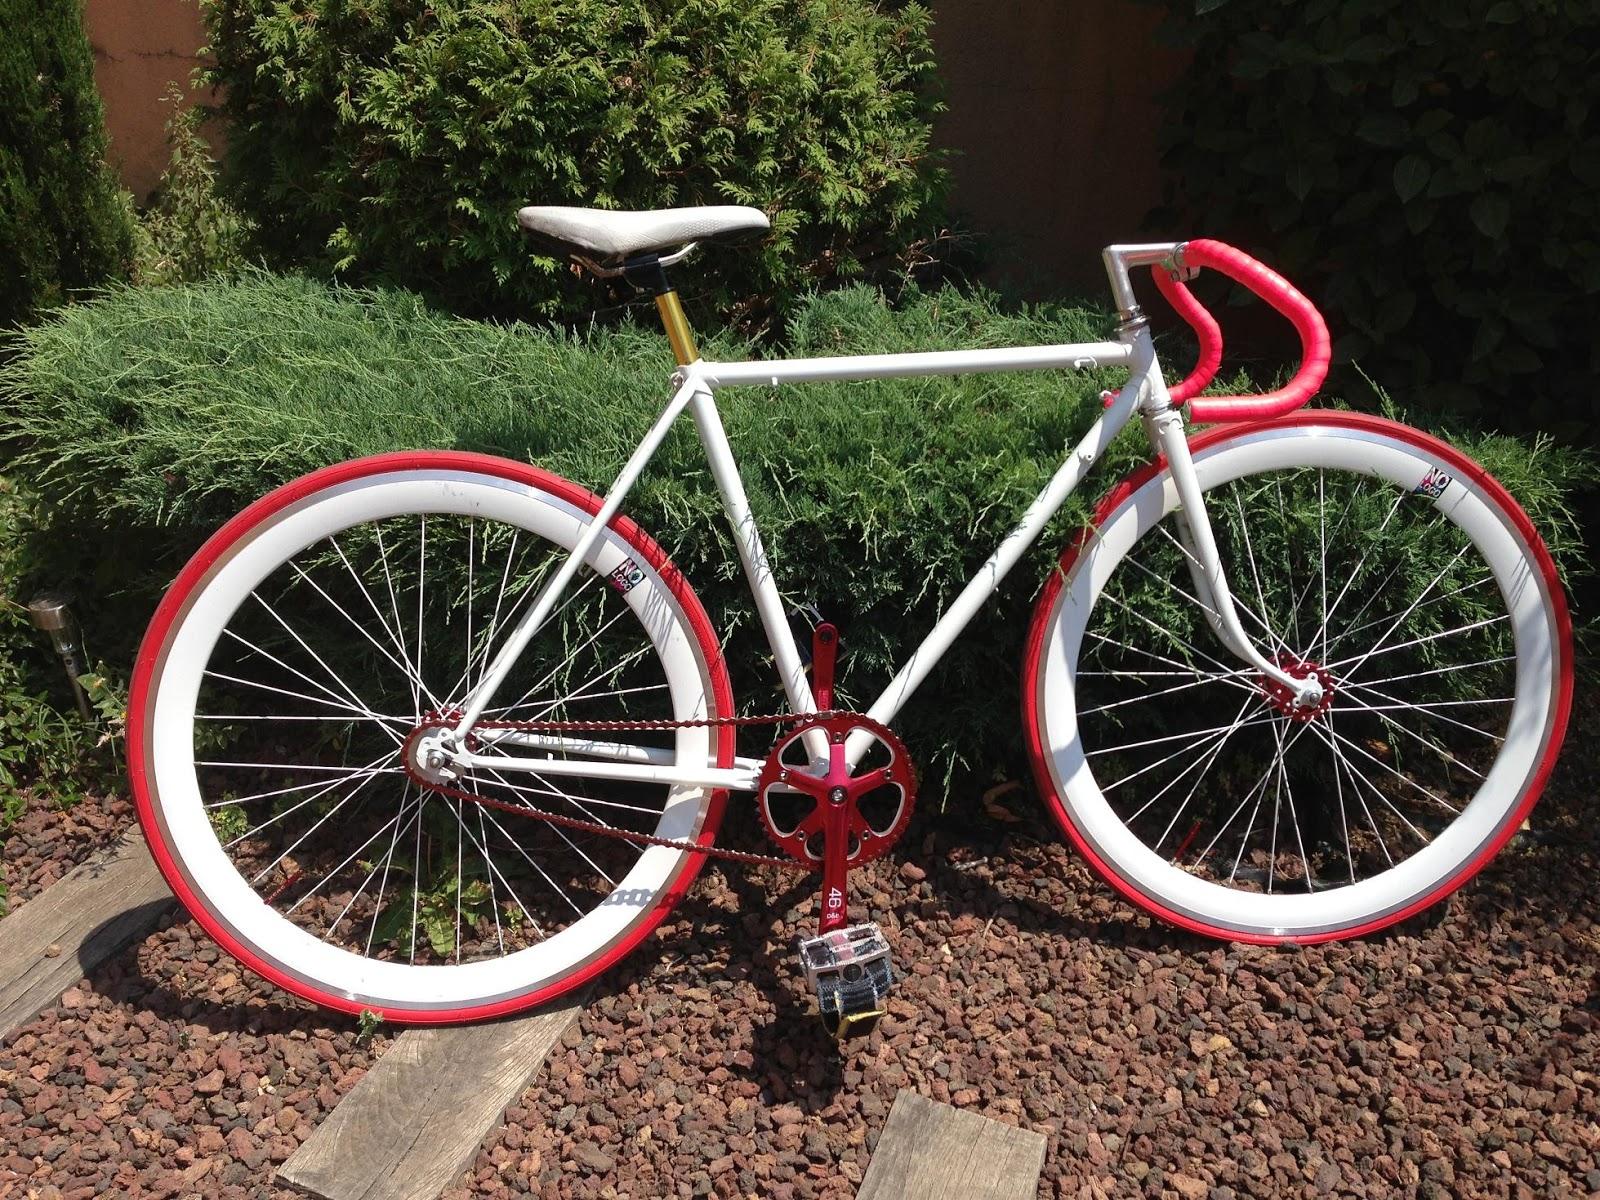 Tunear Bicicleta De Niño: Fixie Bikes, La última Moda Un Poco Tonta